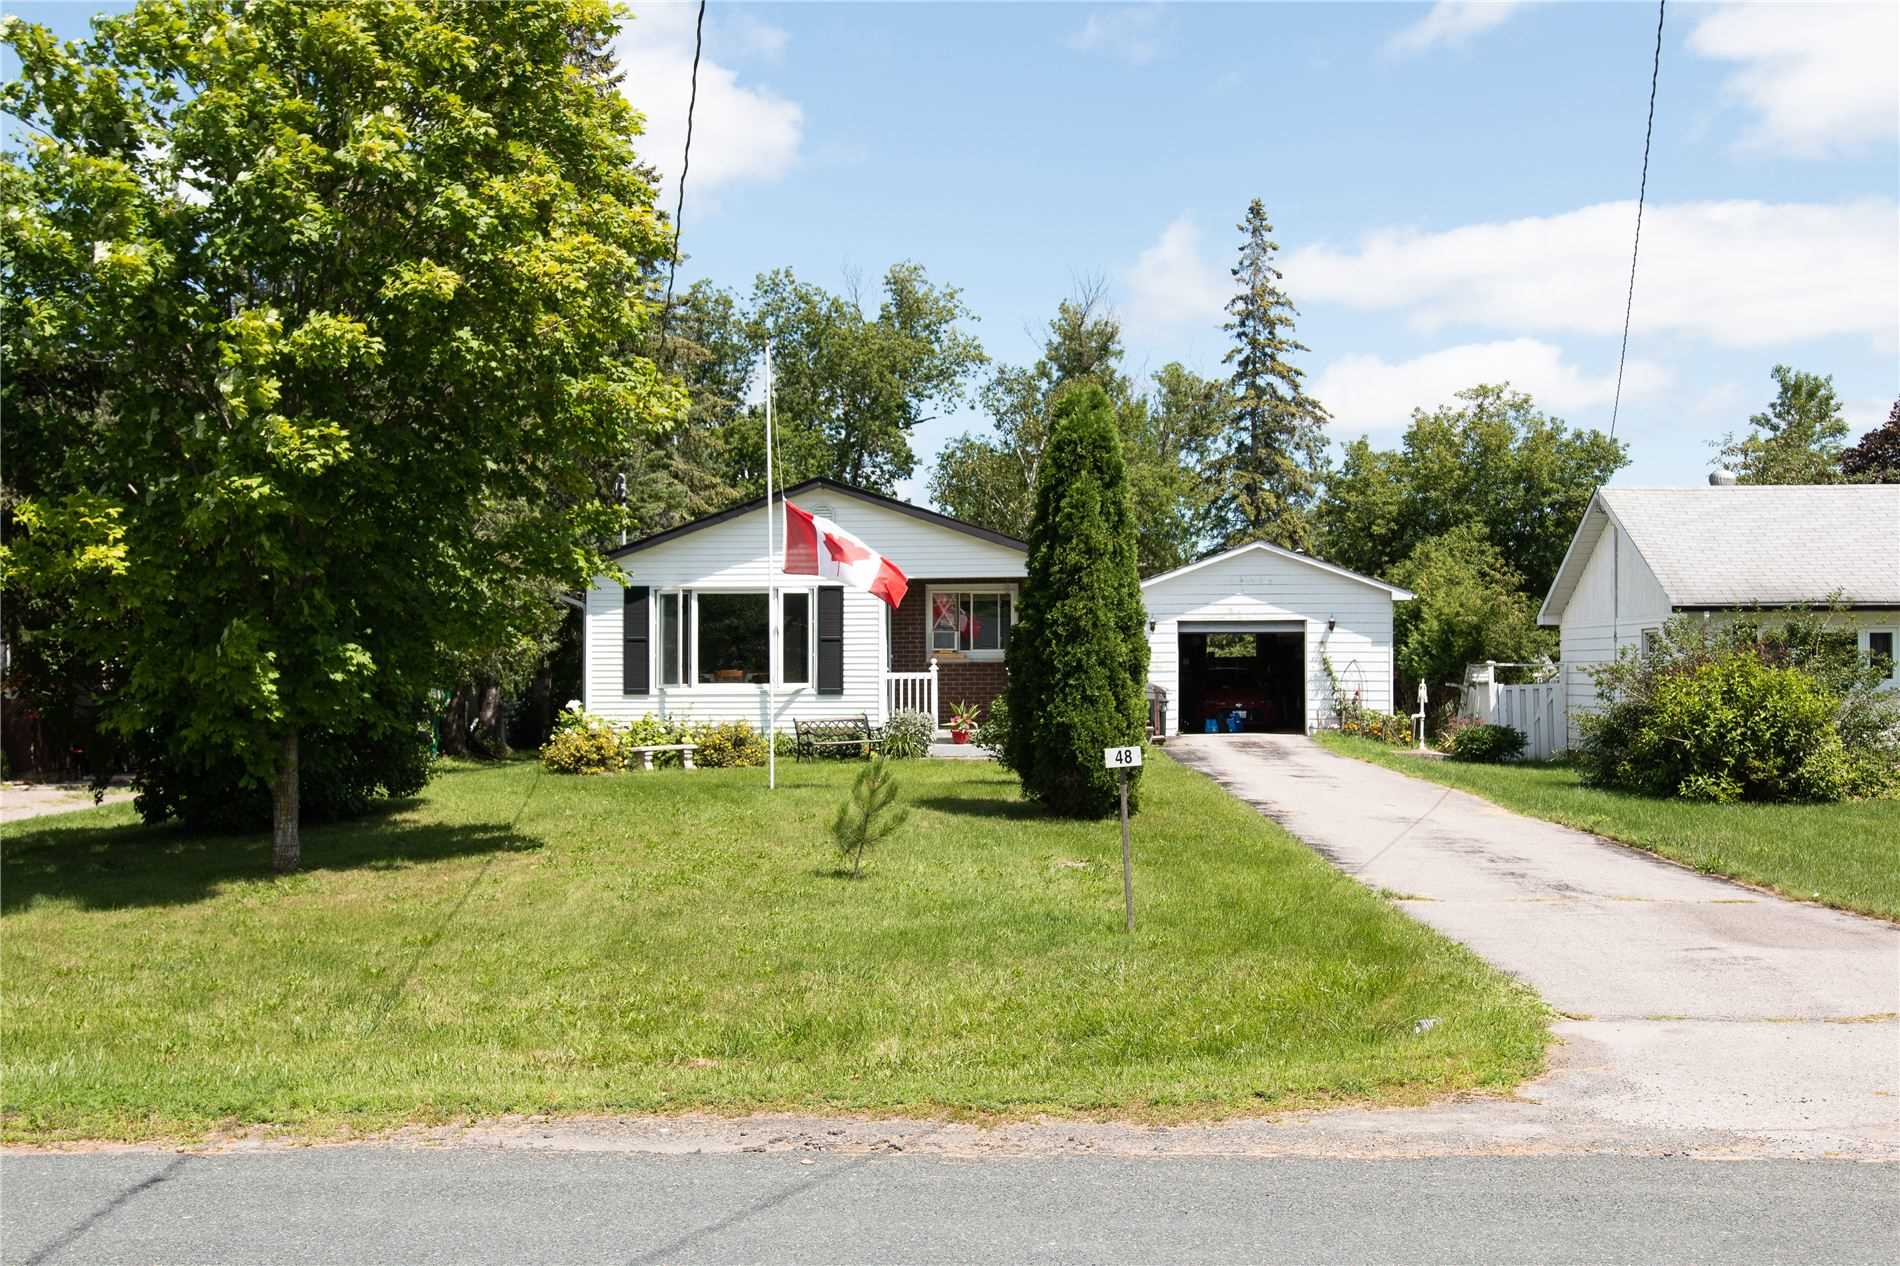 Detached house For Sale In Trent Hills - 48 Clyde St, Trent Hills, Ontario, Canada K0L 1Y0 , 3 Bedrooms Bedrooms, ,1 BathroomBathrooms,Detached,For Sale,Clyde